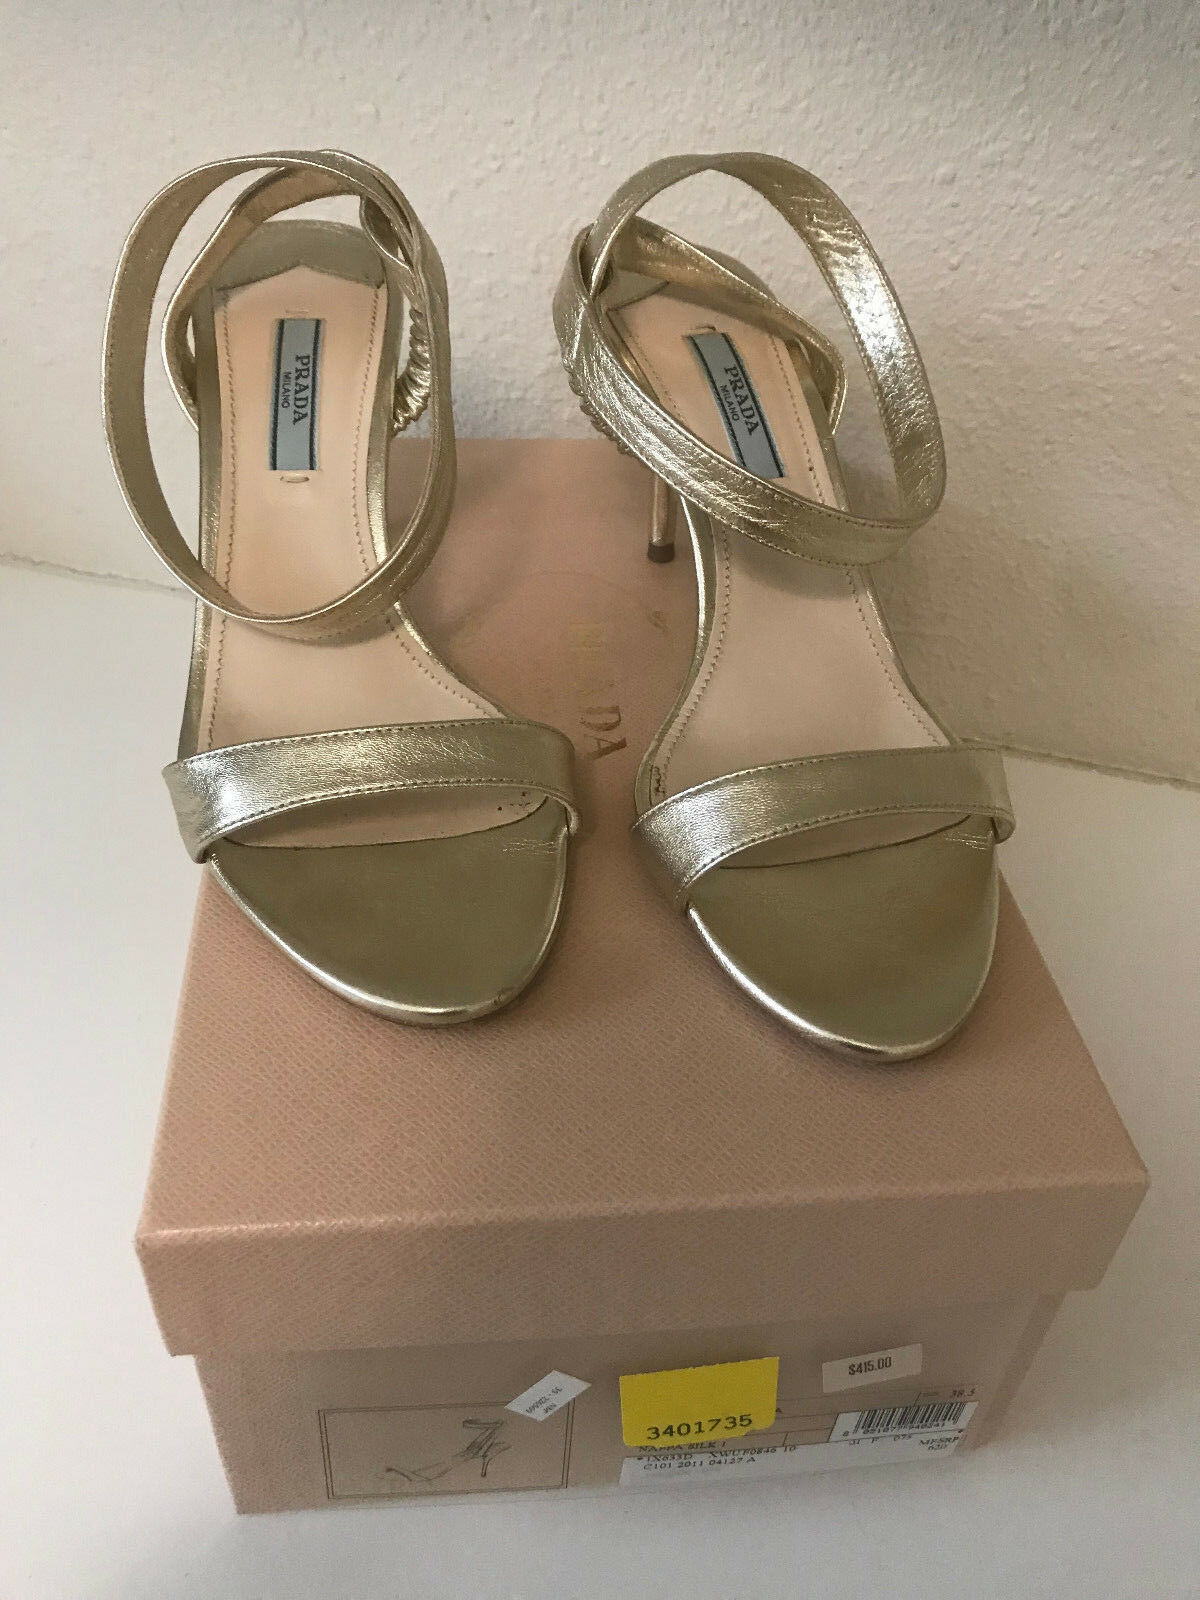 Prada Nappa Silk Pirite oro Ankle Strap Heels w  Box -  Sz 38.5